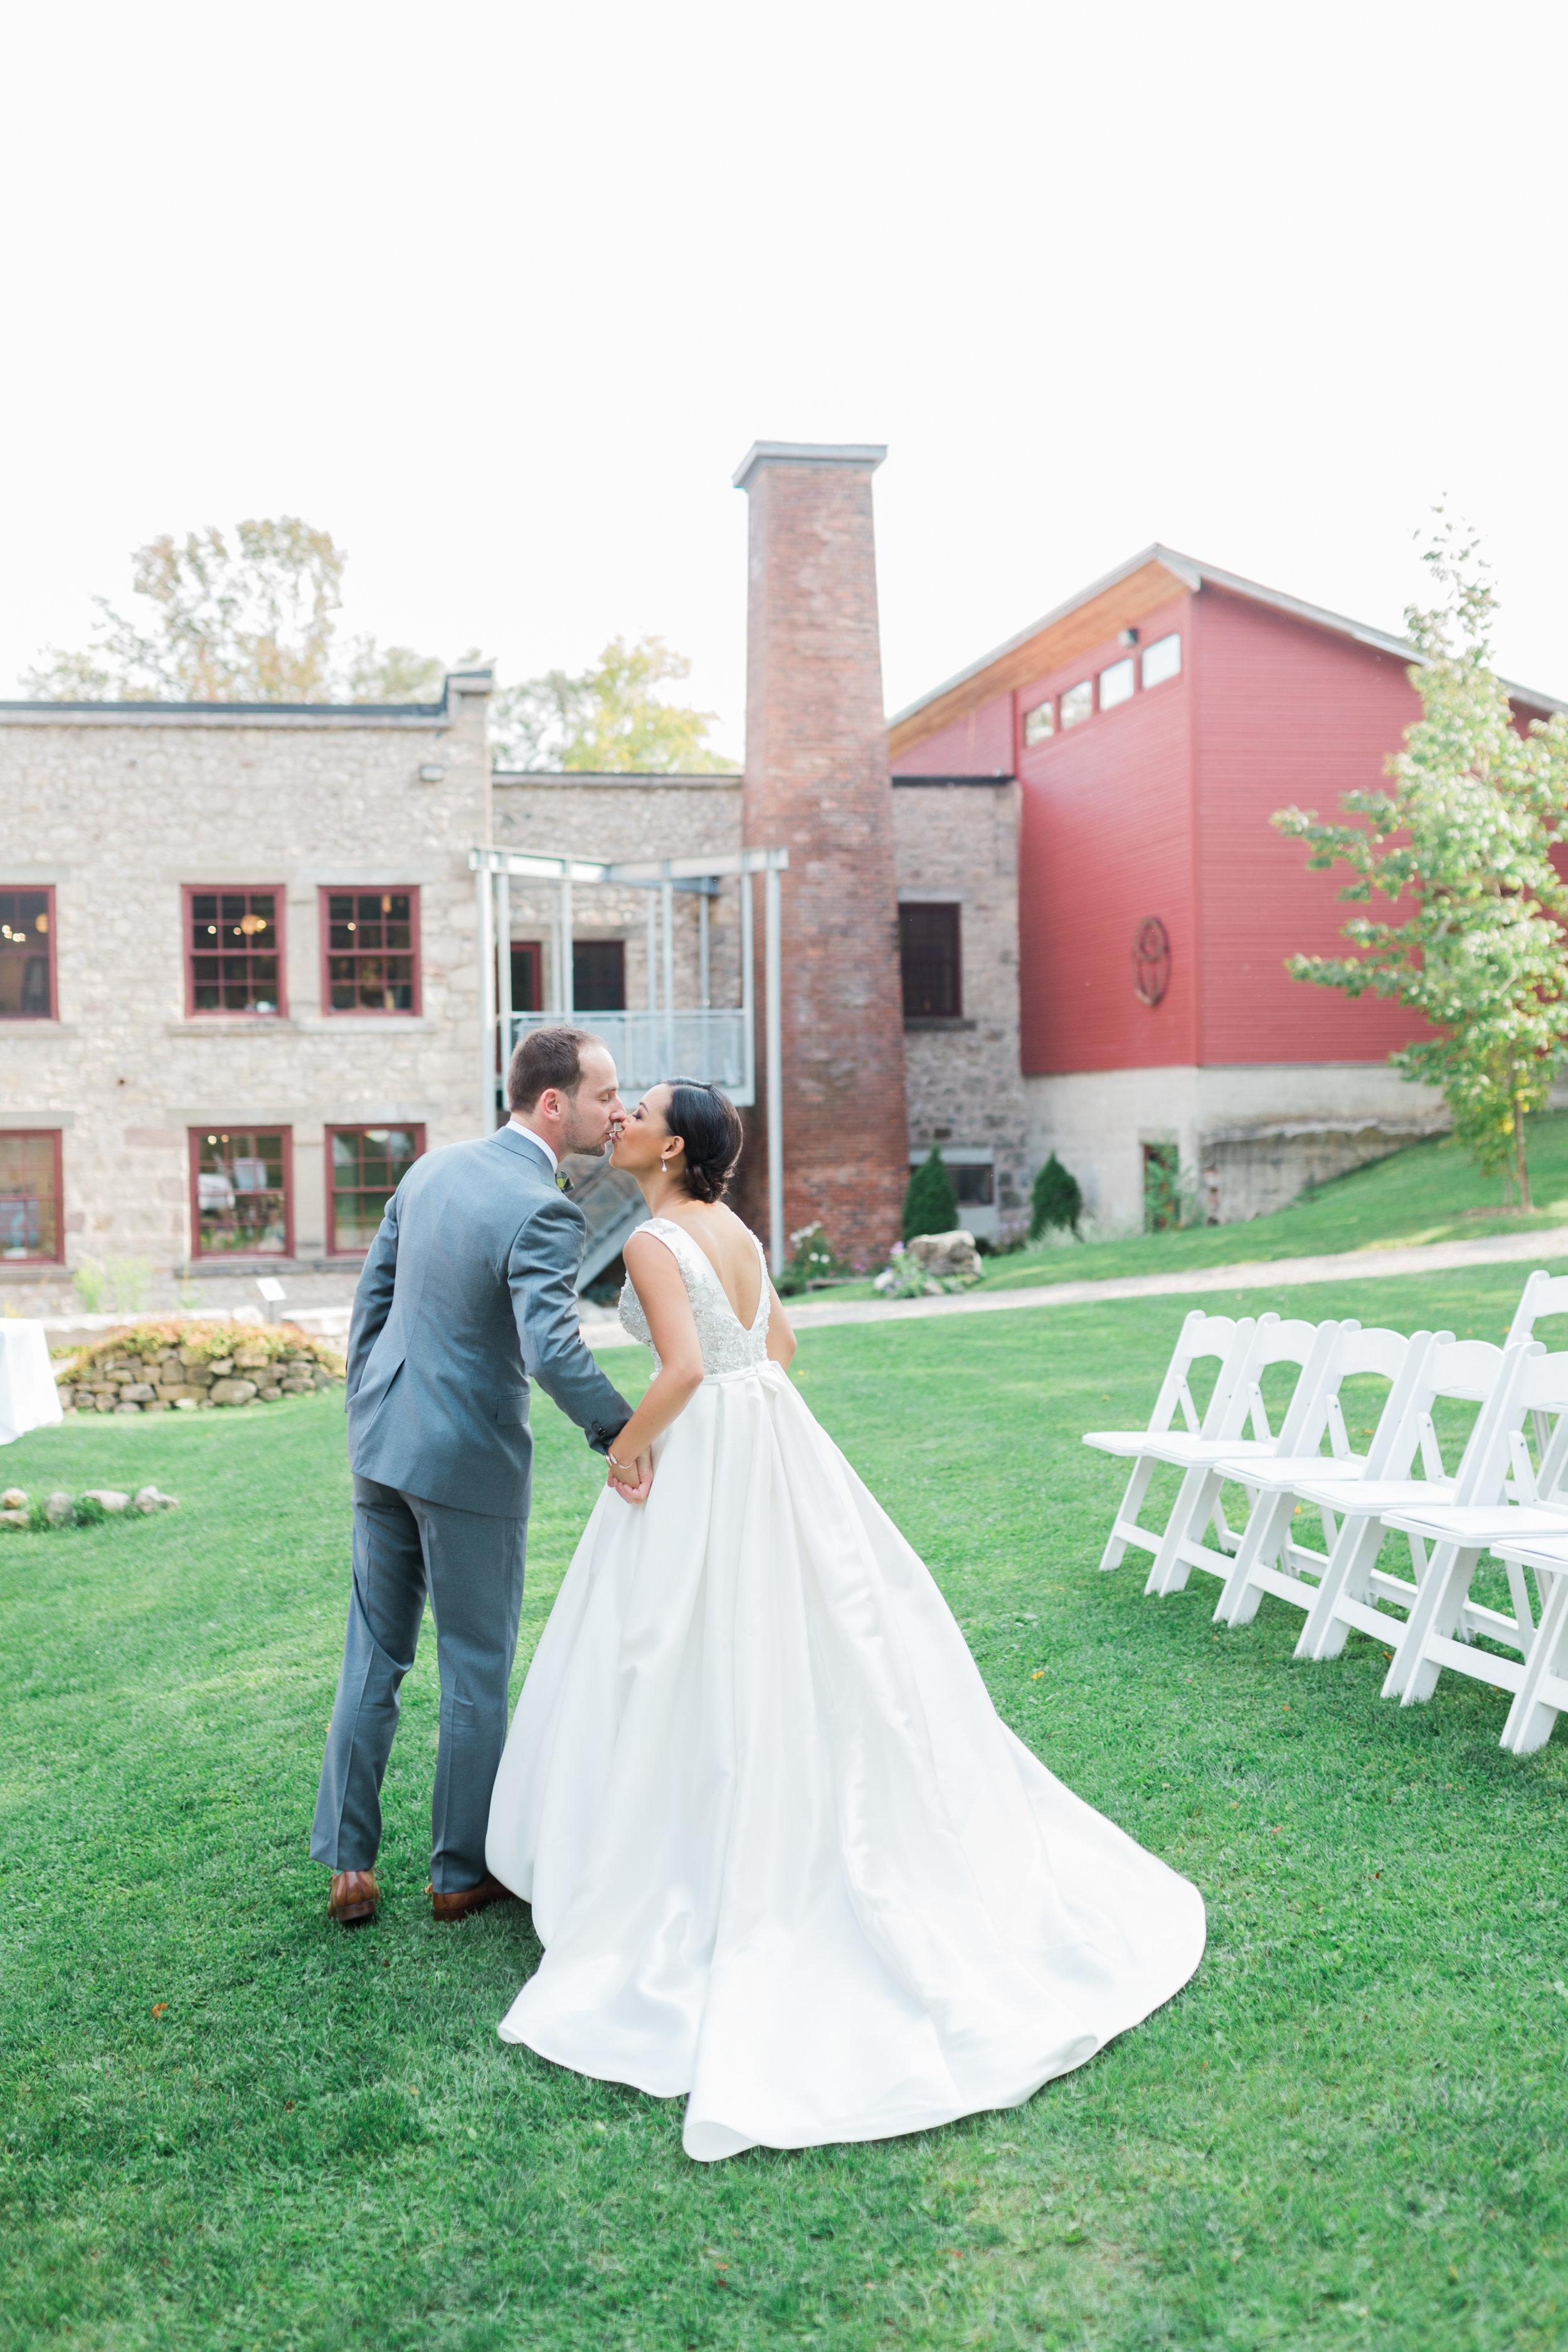 Alton Mills Wedding - First Look-19.jpg